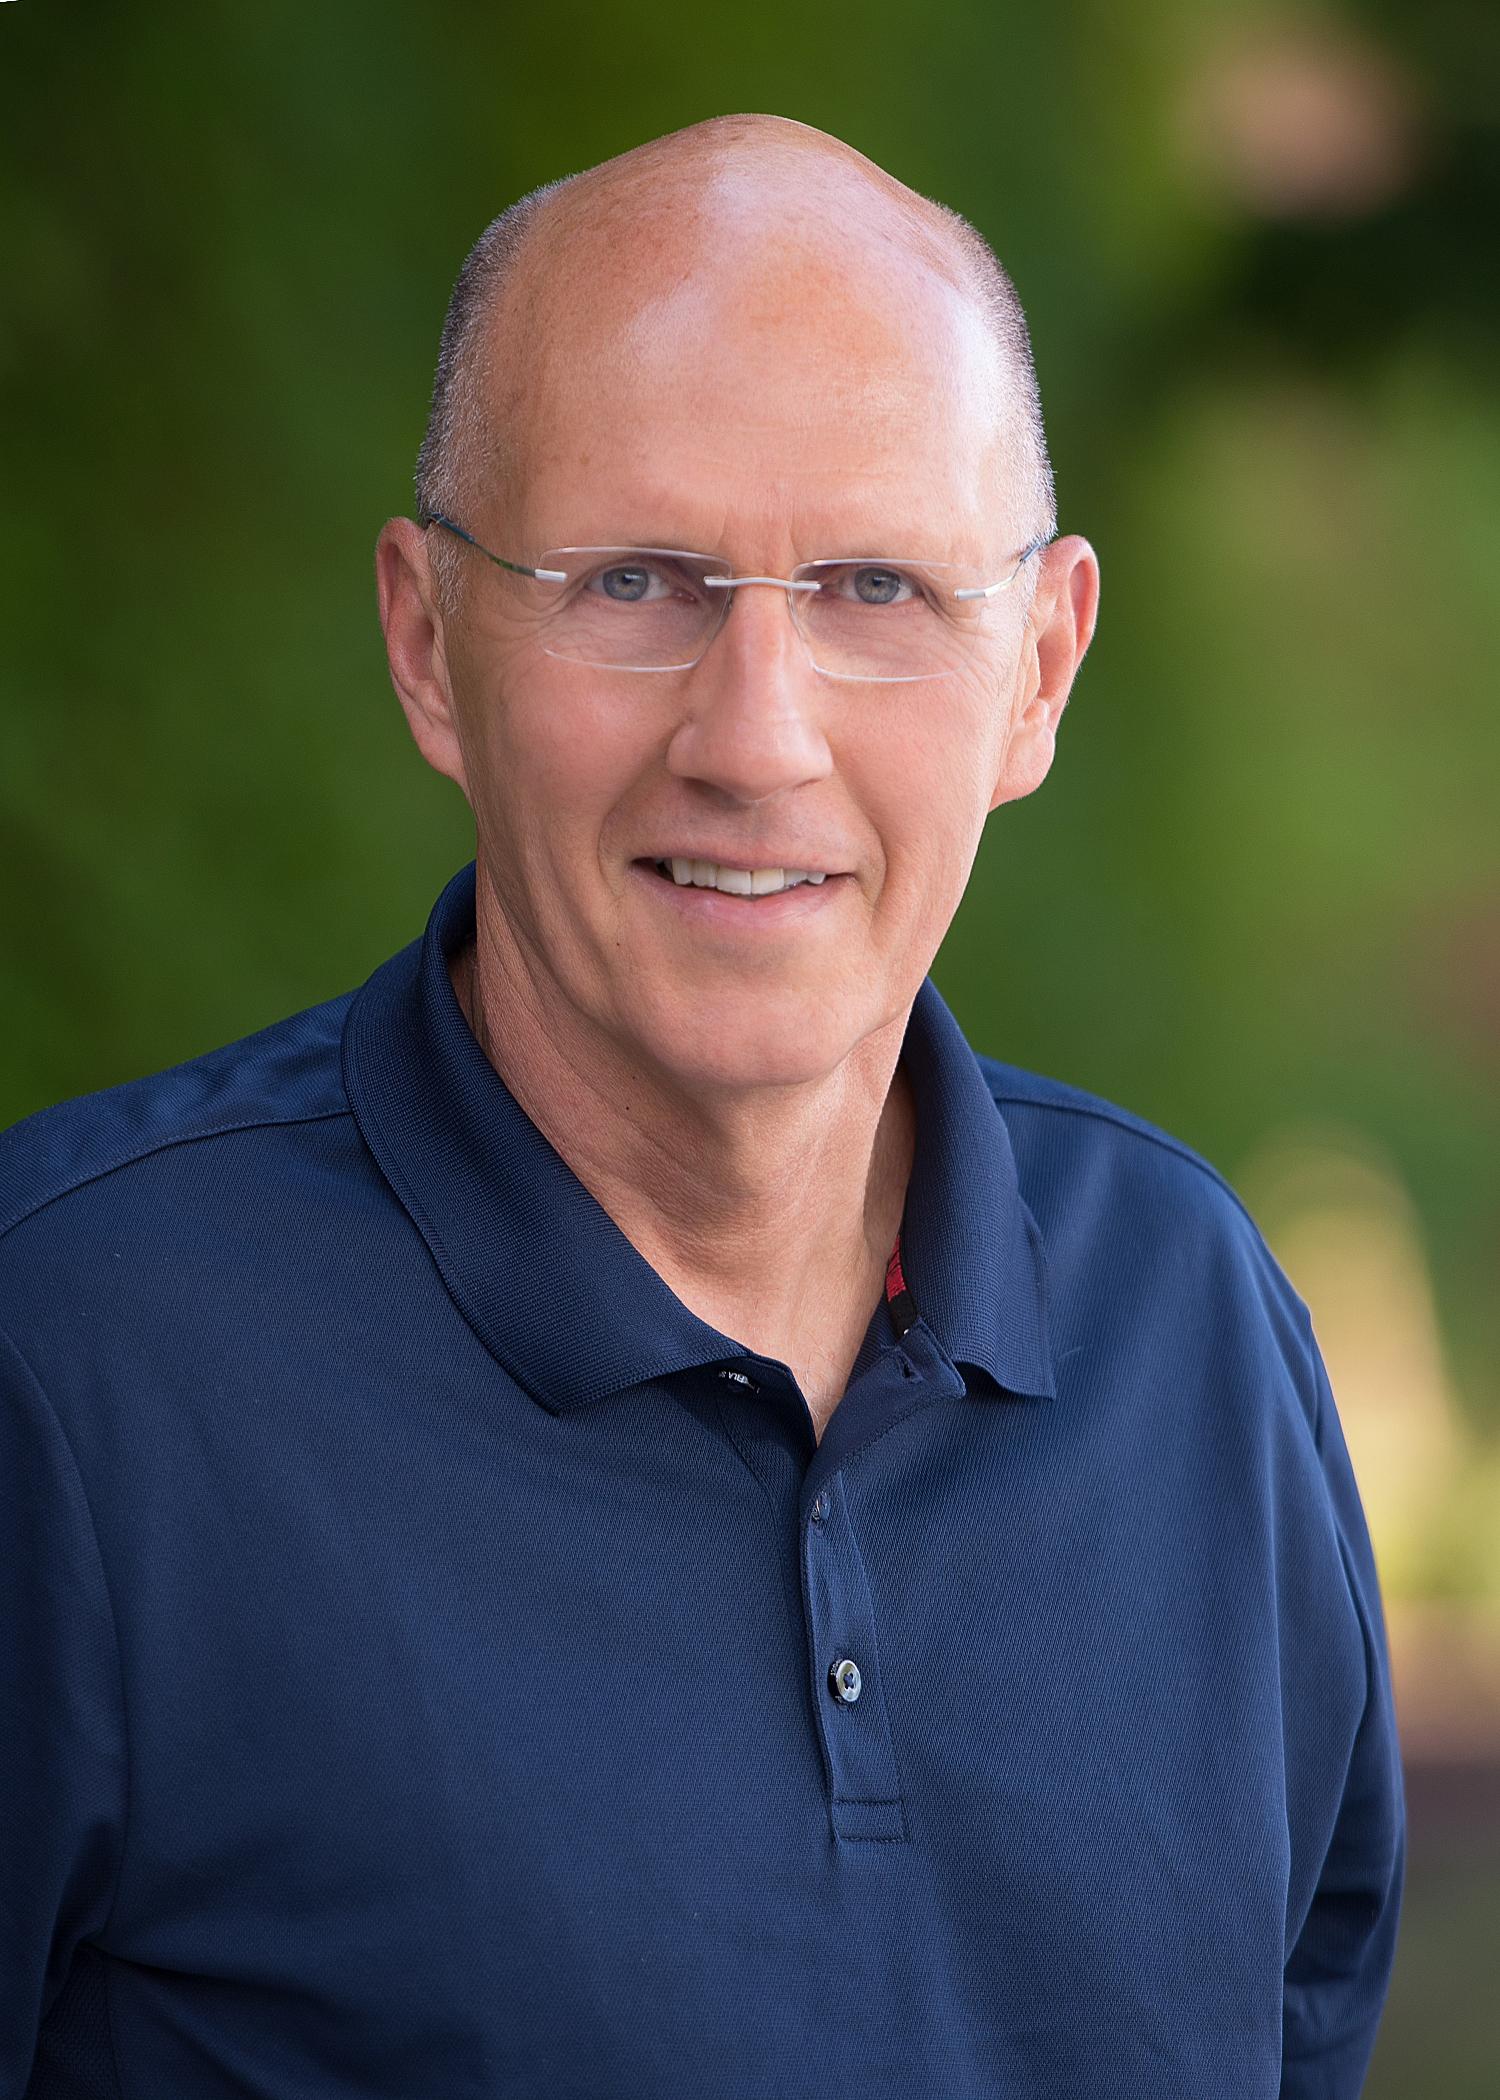 Tim Kooi, Vice-Chair